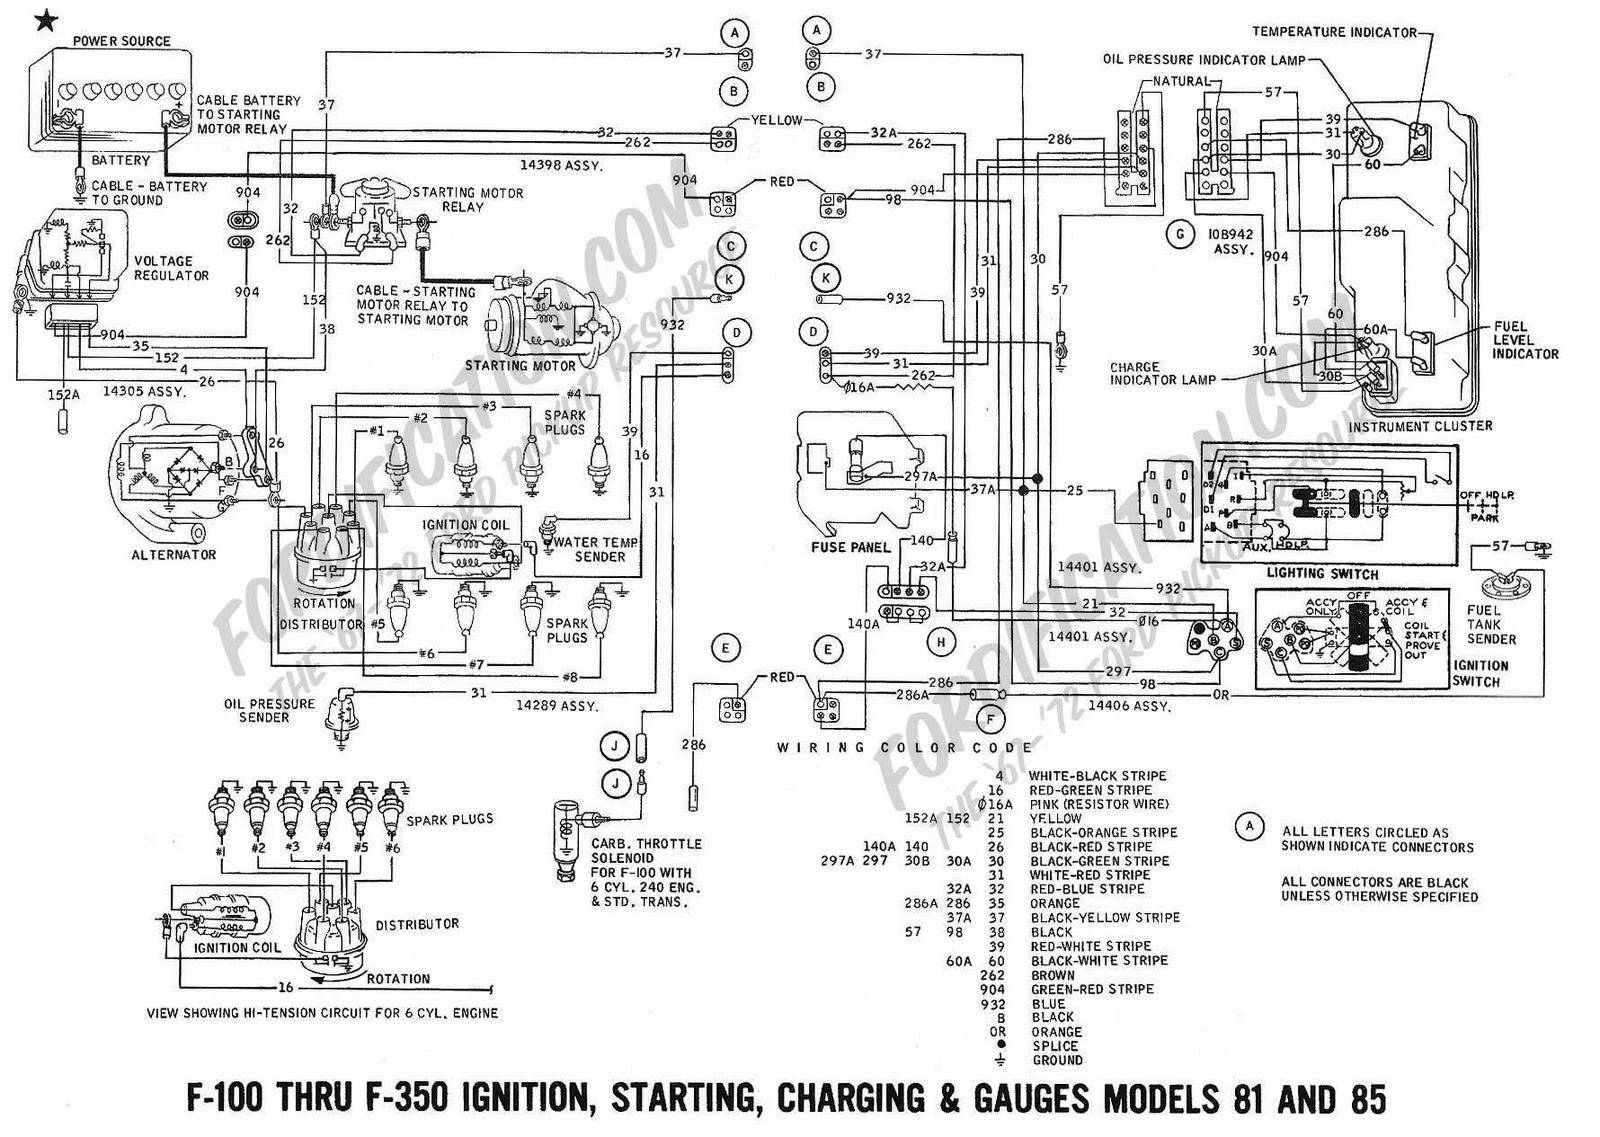 1967 ford f250 wiring diagram wiring diagram ford f350 wiring wiring data diagramford f 350 ignition module wiring wiring diagram ford f350 u